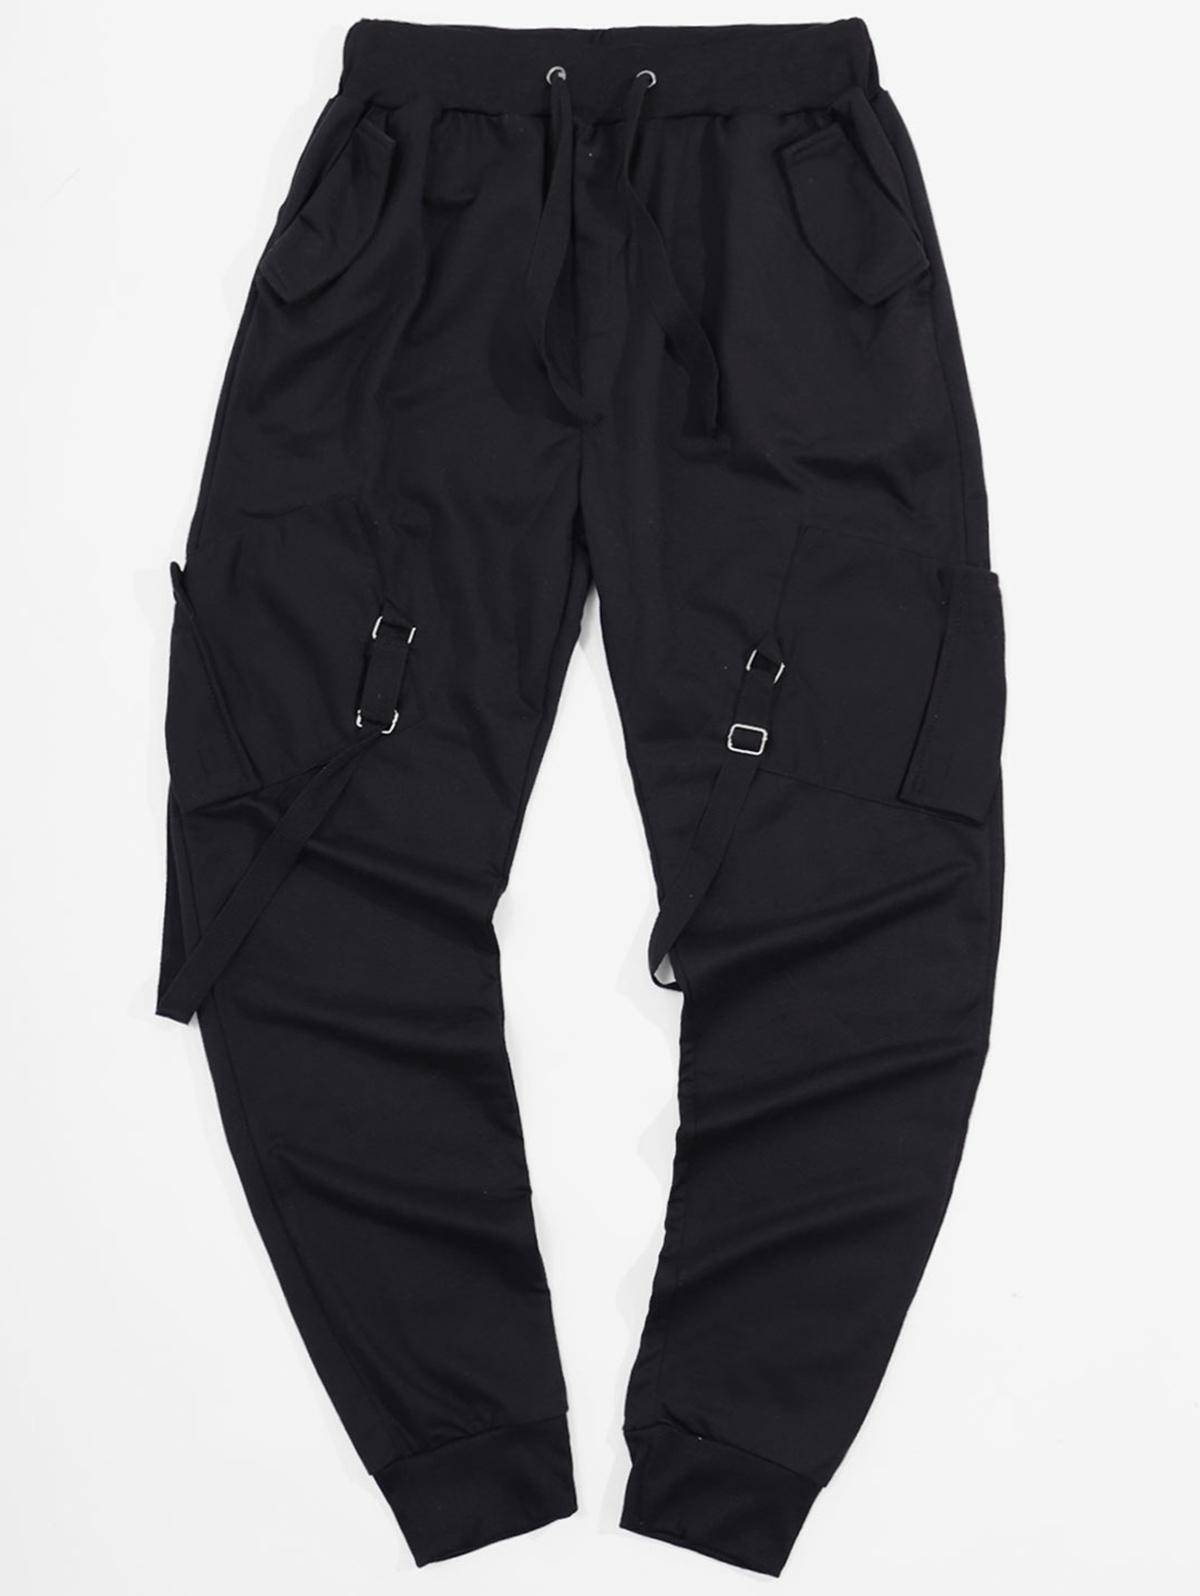 Ribbon Pockets Long Elastic Sport Cargo Pants in BLACK - Size: 3X-Large